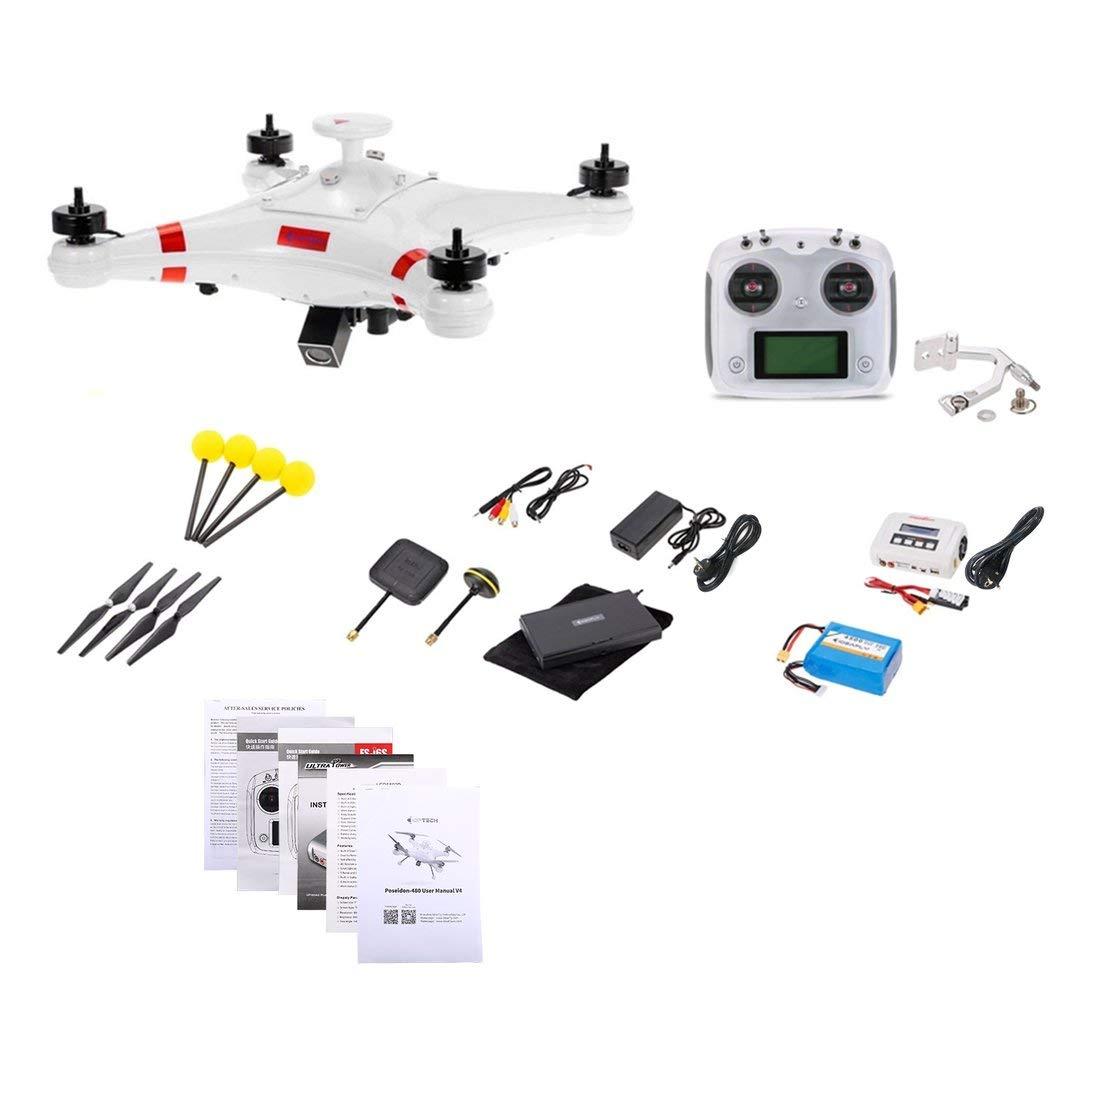 Formulaone H480 Brushless 5.8G FPV 700TVL Kamera GPS Quadcopter Flugzeuge UAV mit OSD Wasserdicht Professionelle Angeln RC Drone